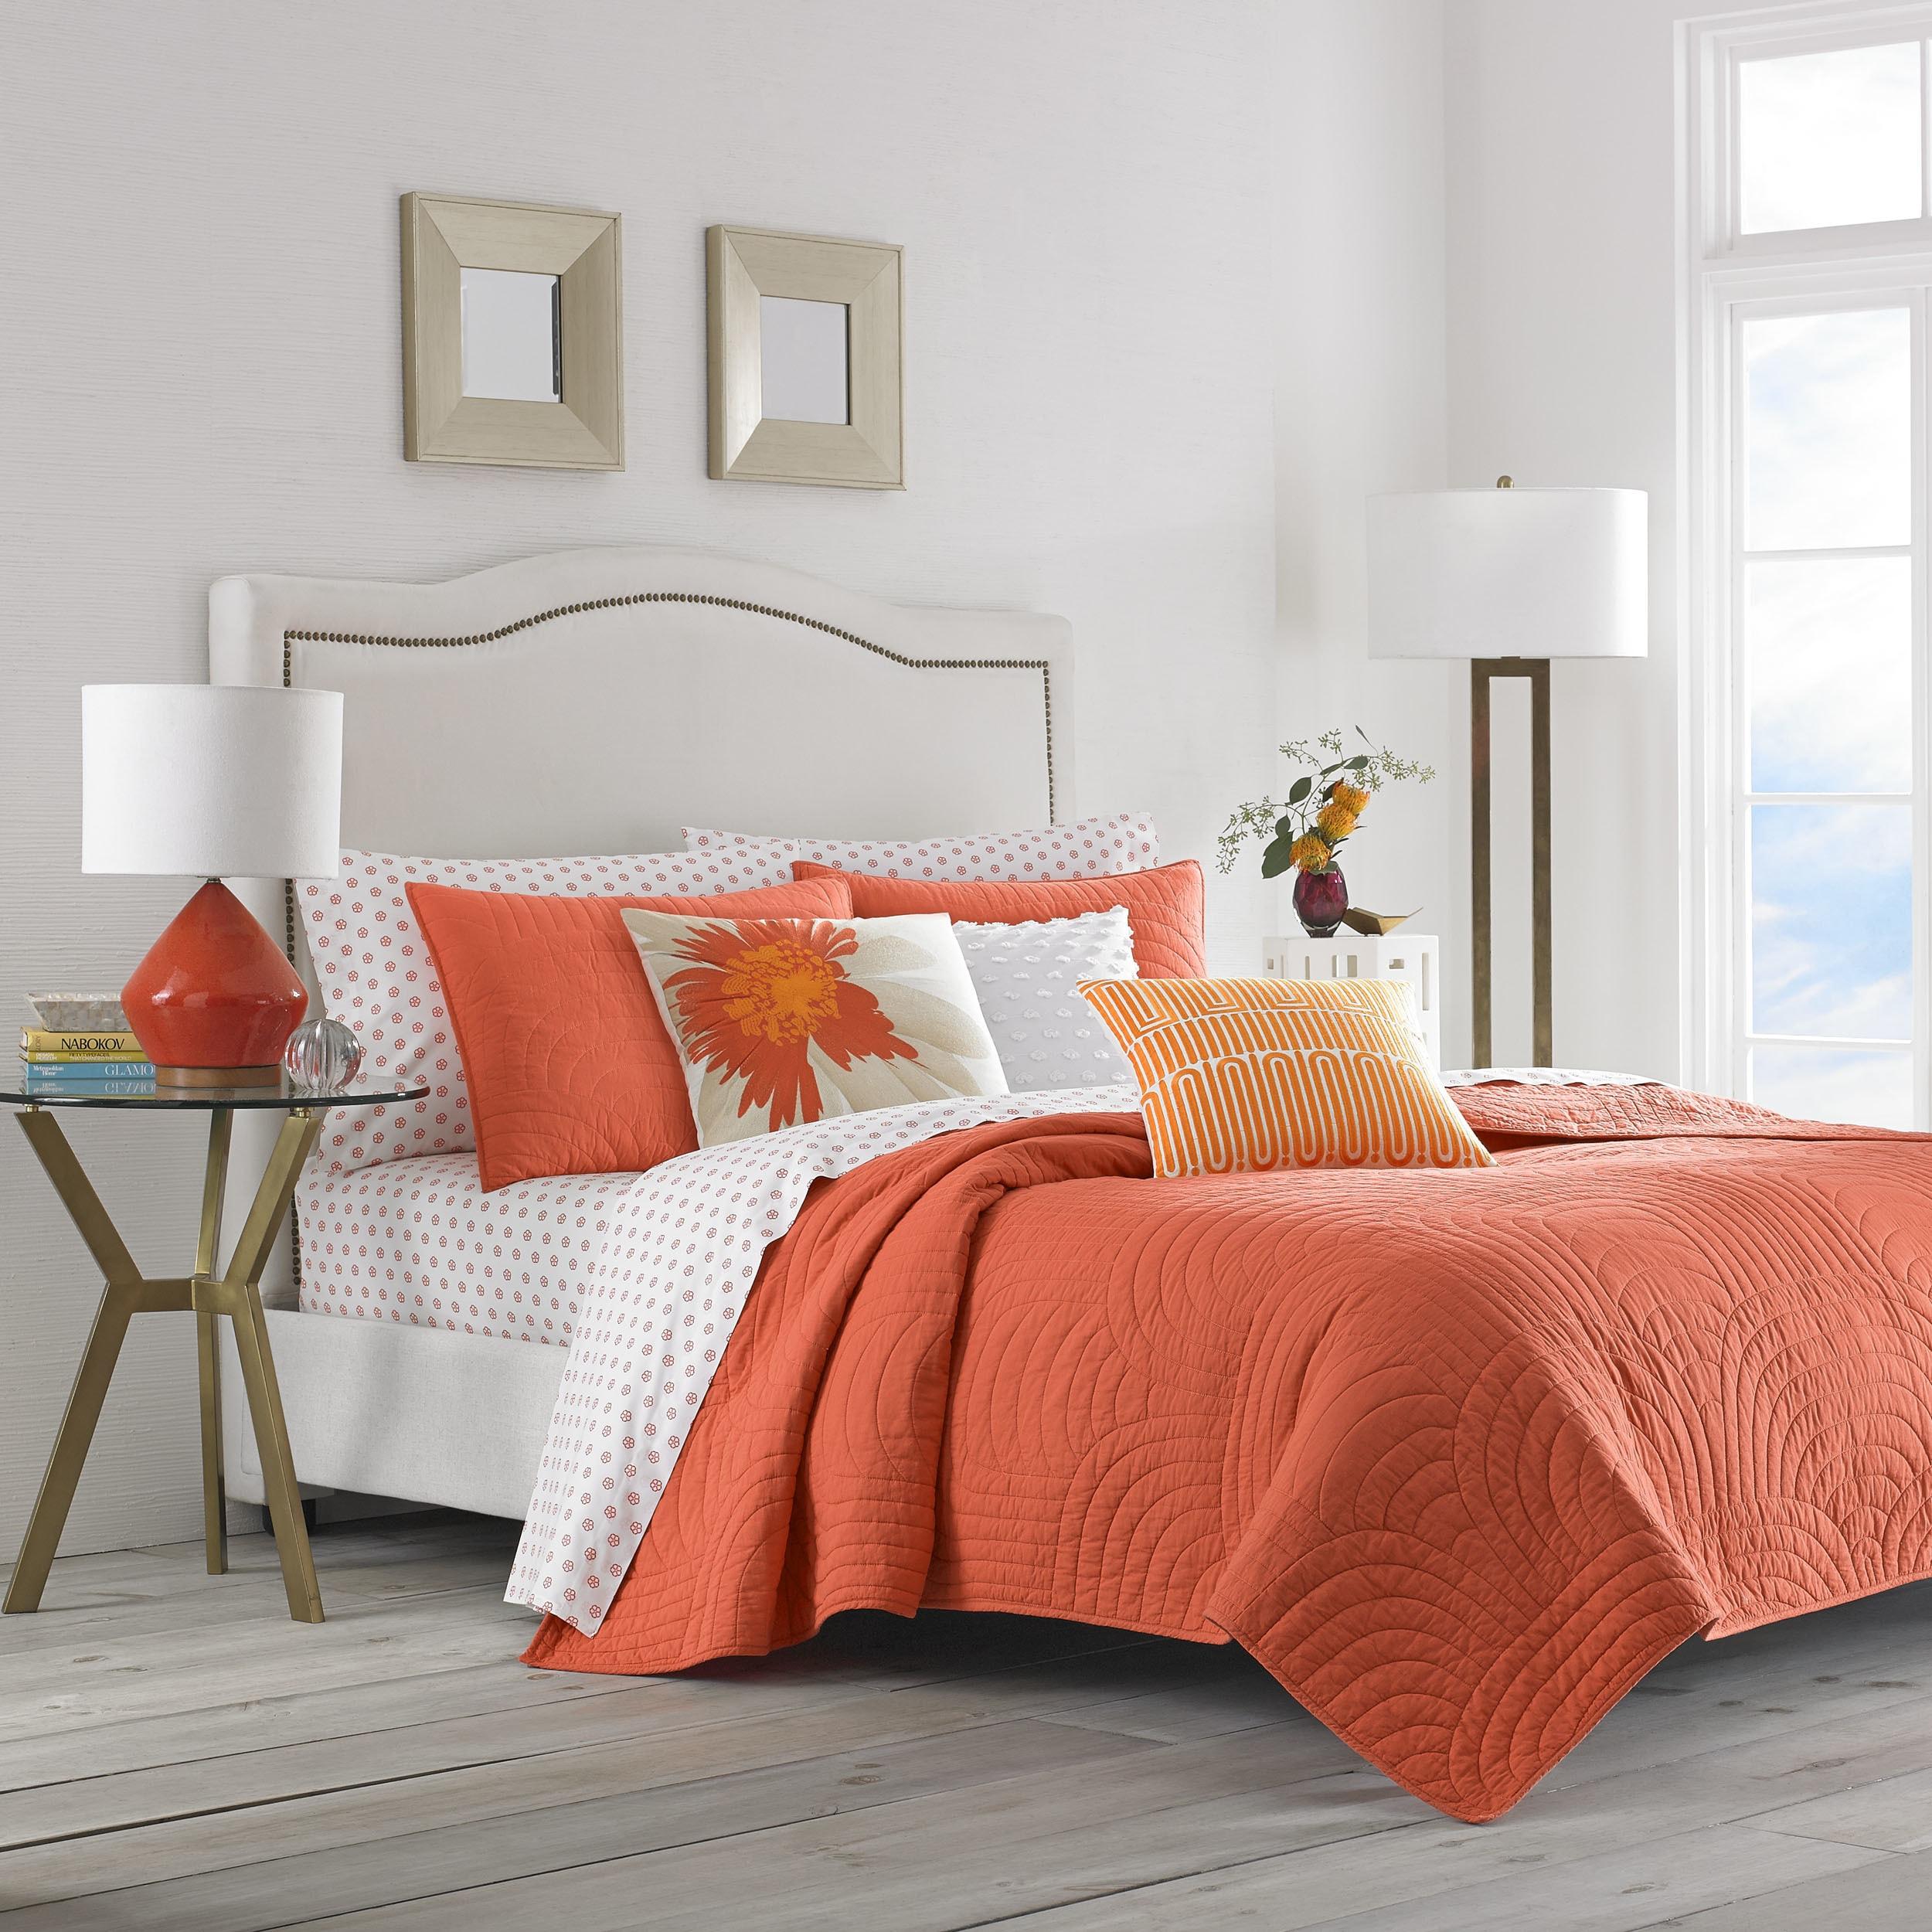 orange lexie lexieorange century cover textiles duvet from set